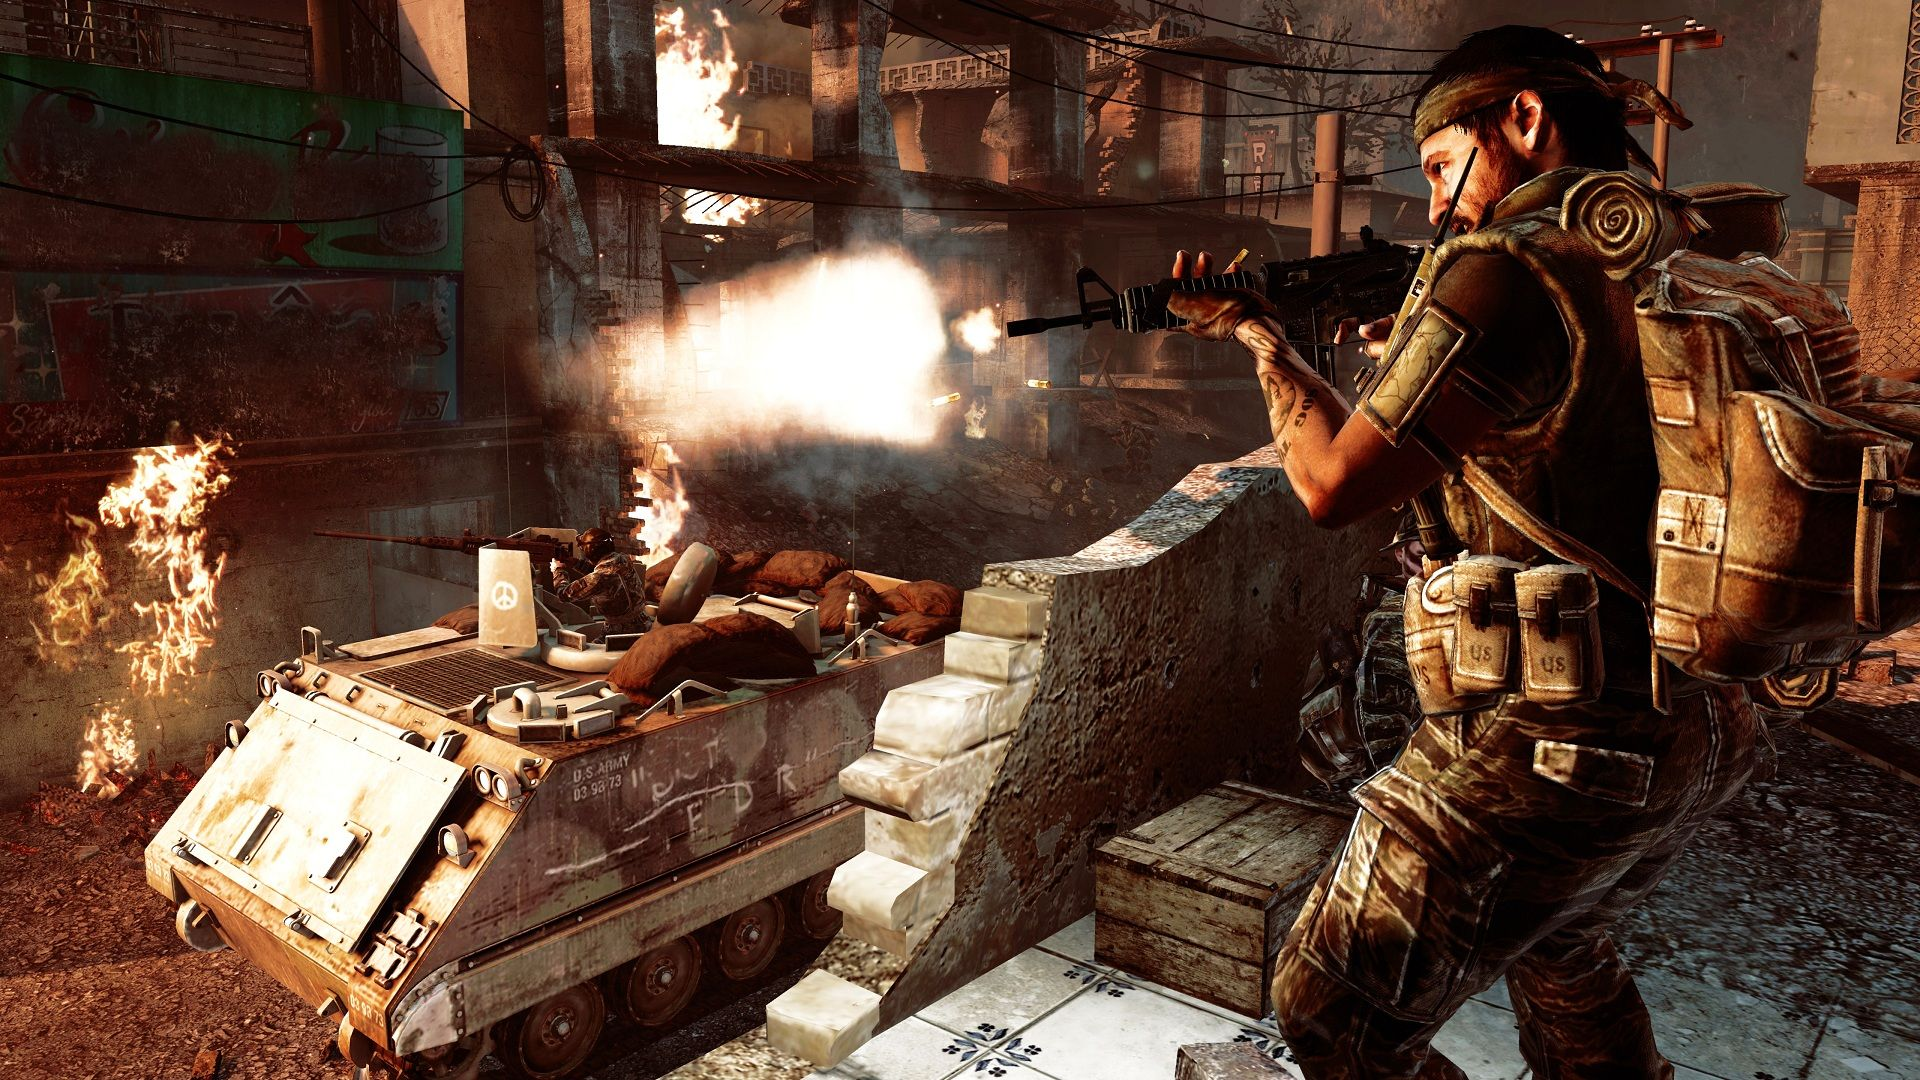 Call of Duty: Black Ops - Multiplayer screenshot